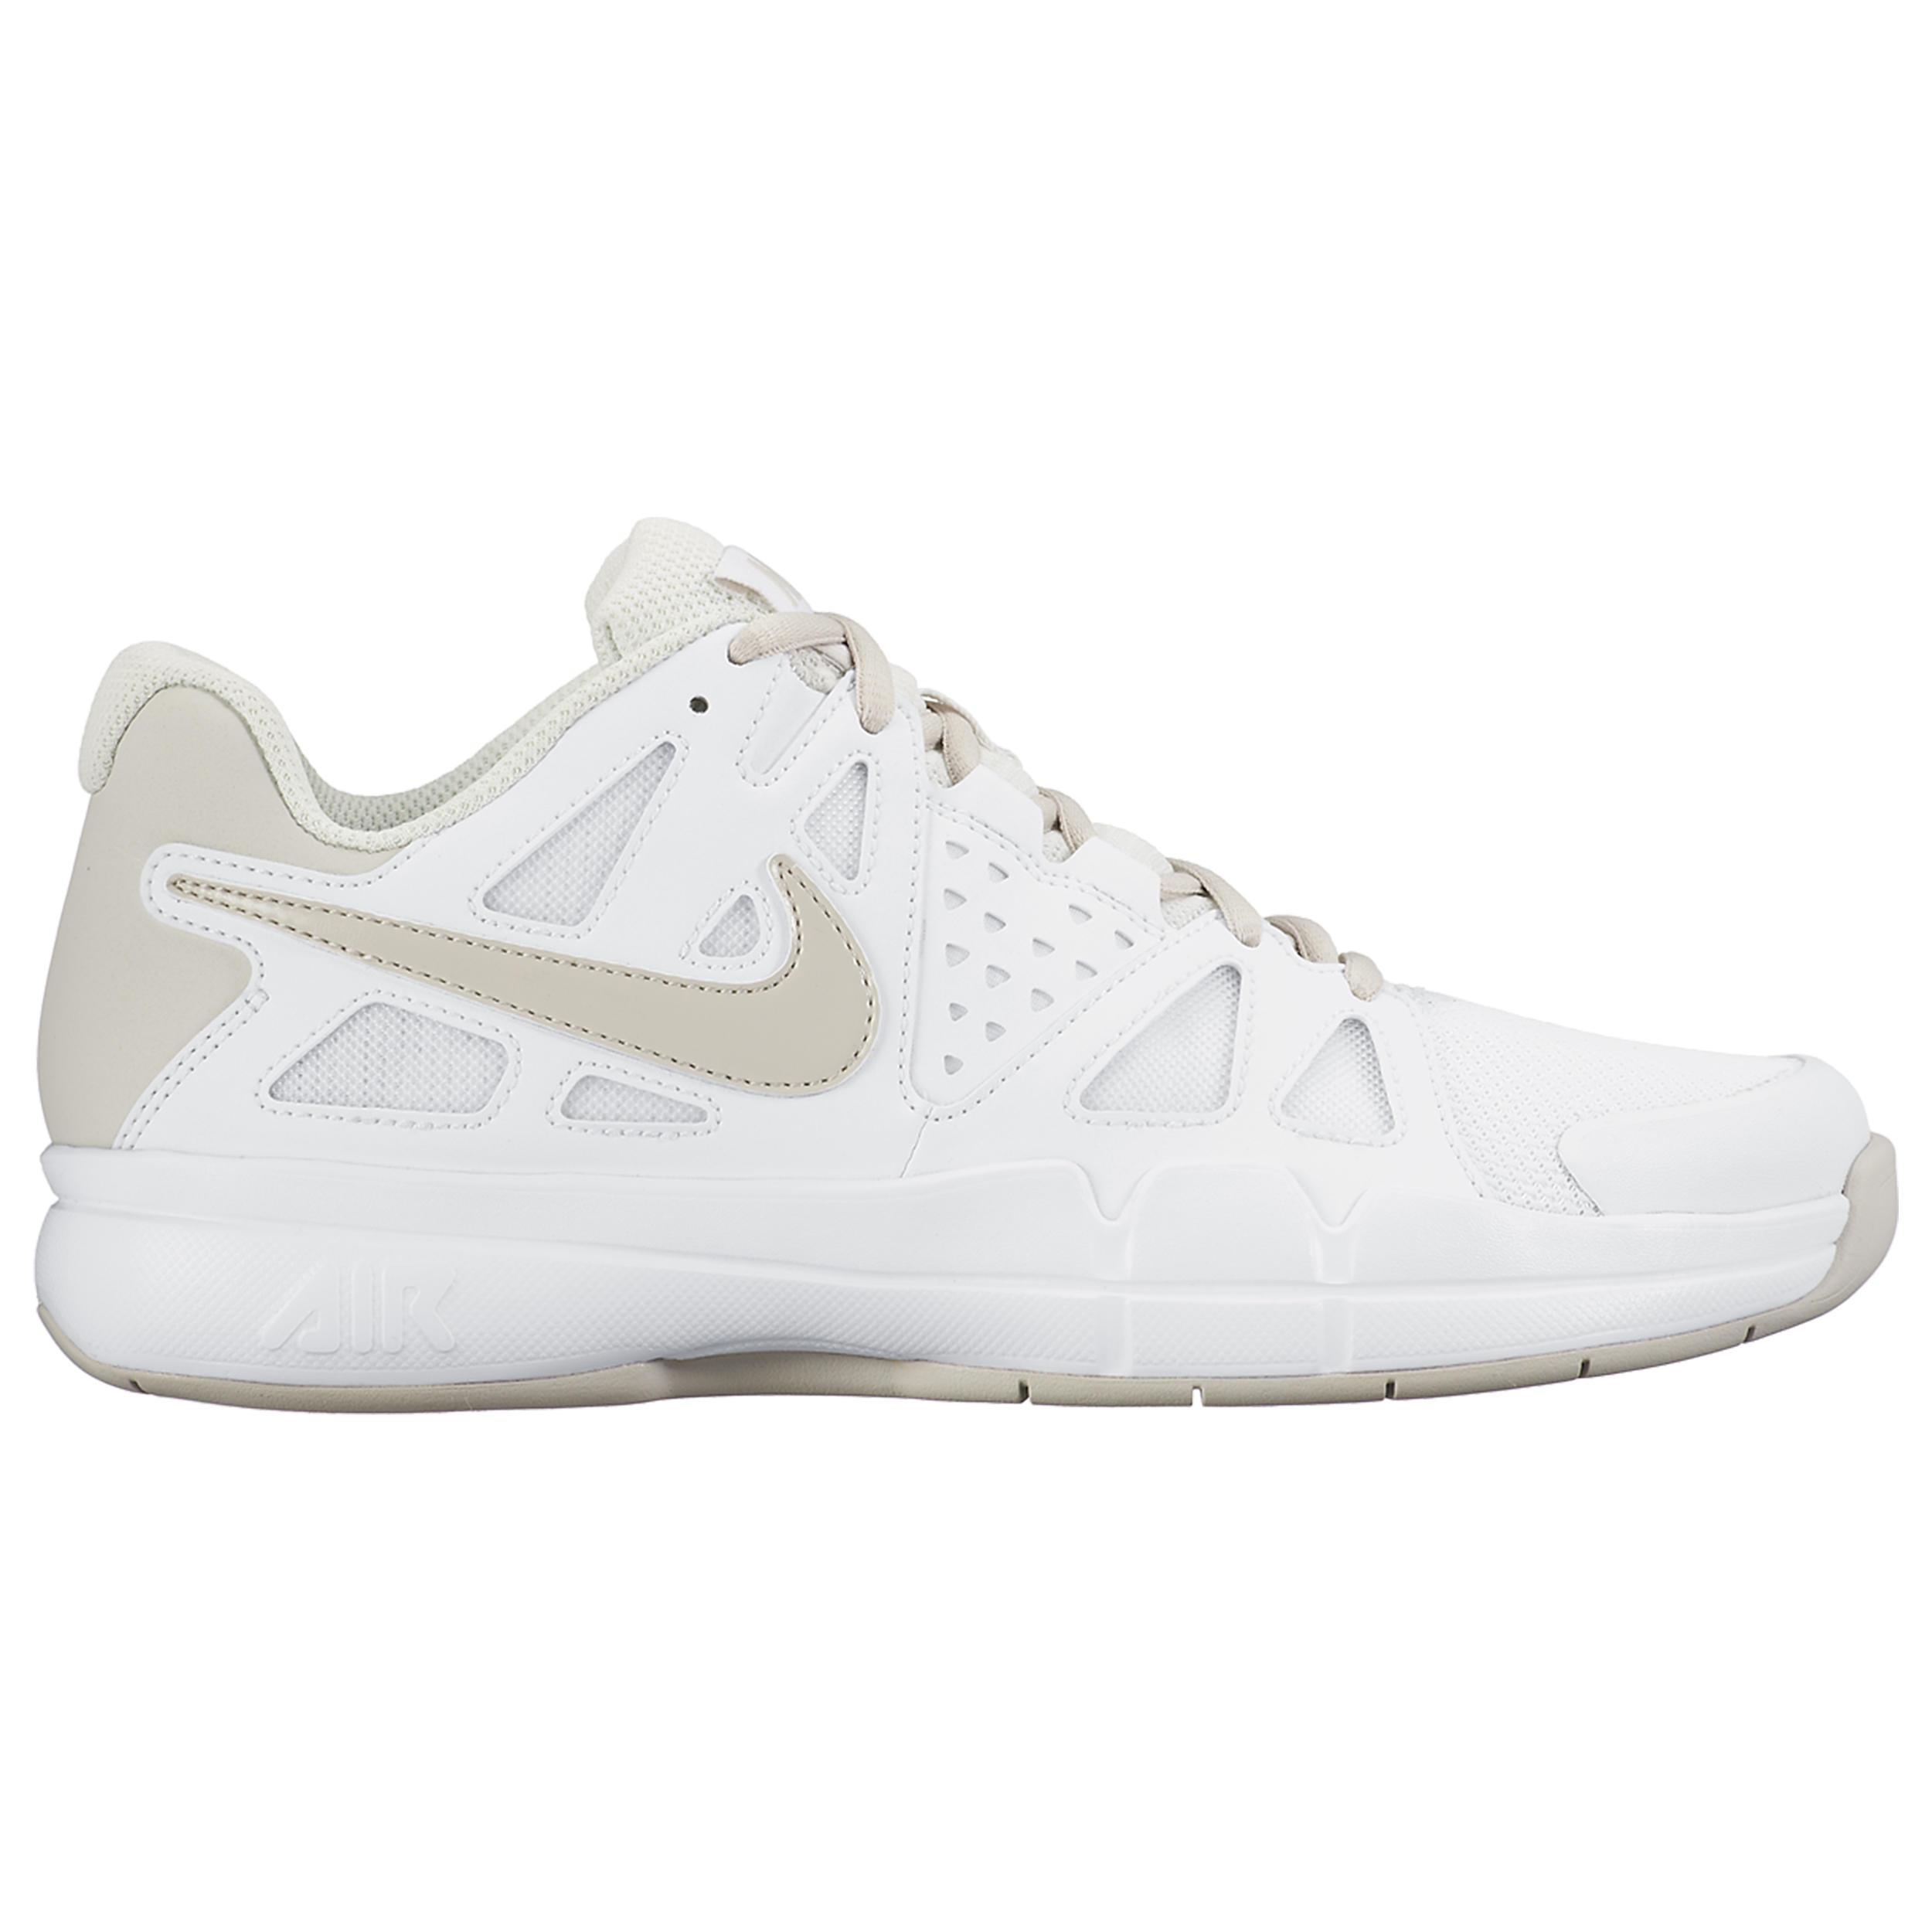 Moquette Tennis Chaussures Air Advantage Vapor Femme R5LS34cAqj